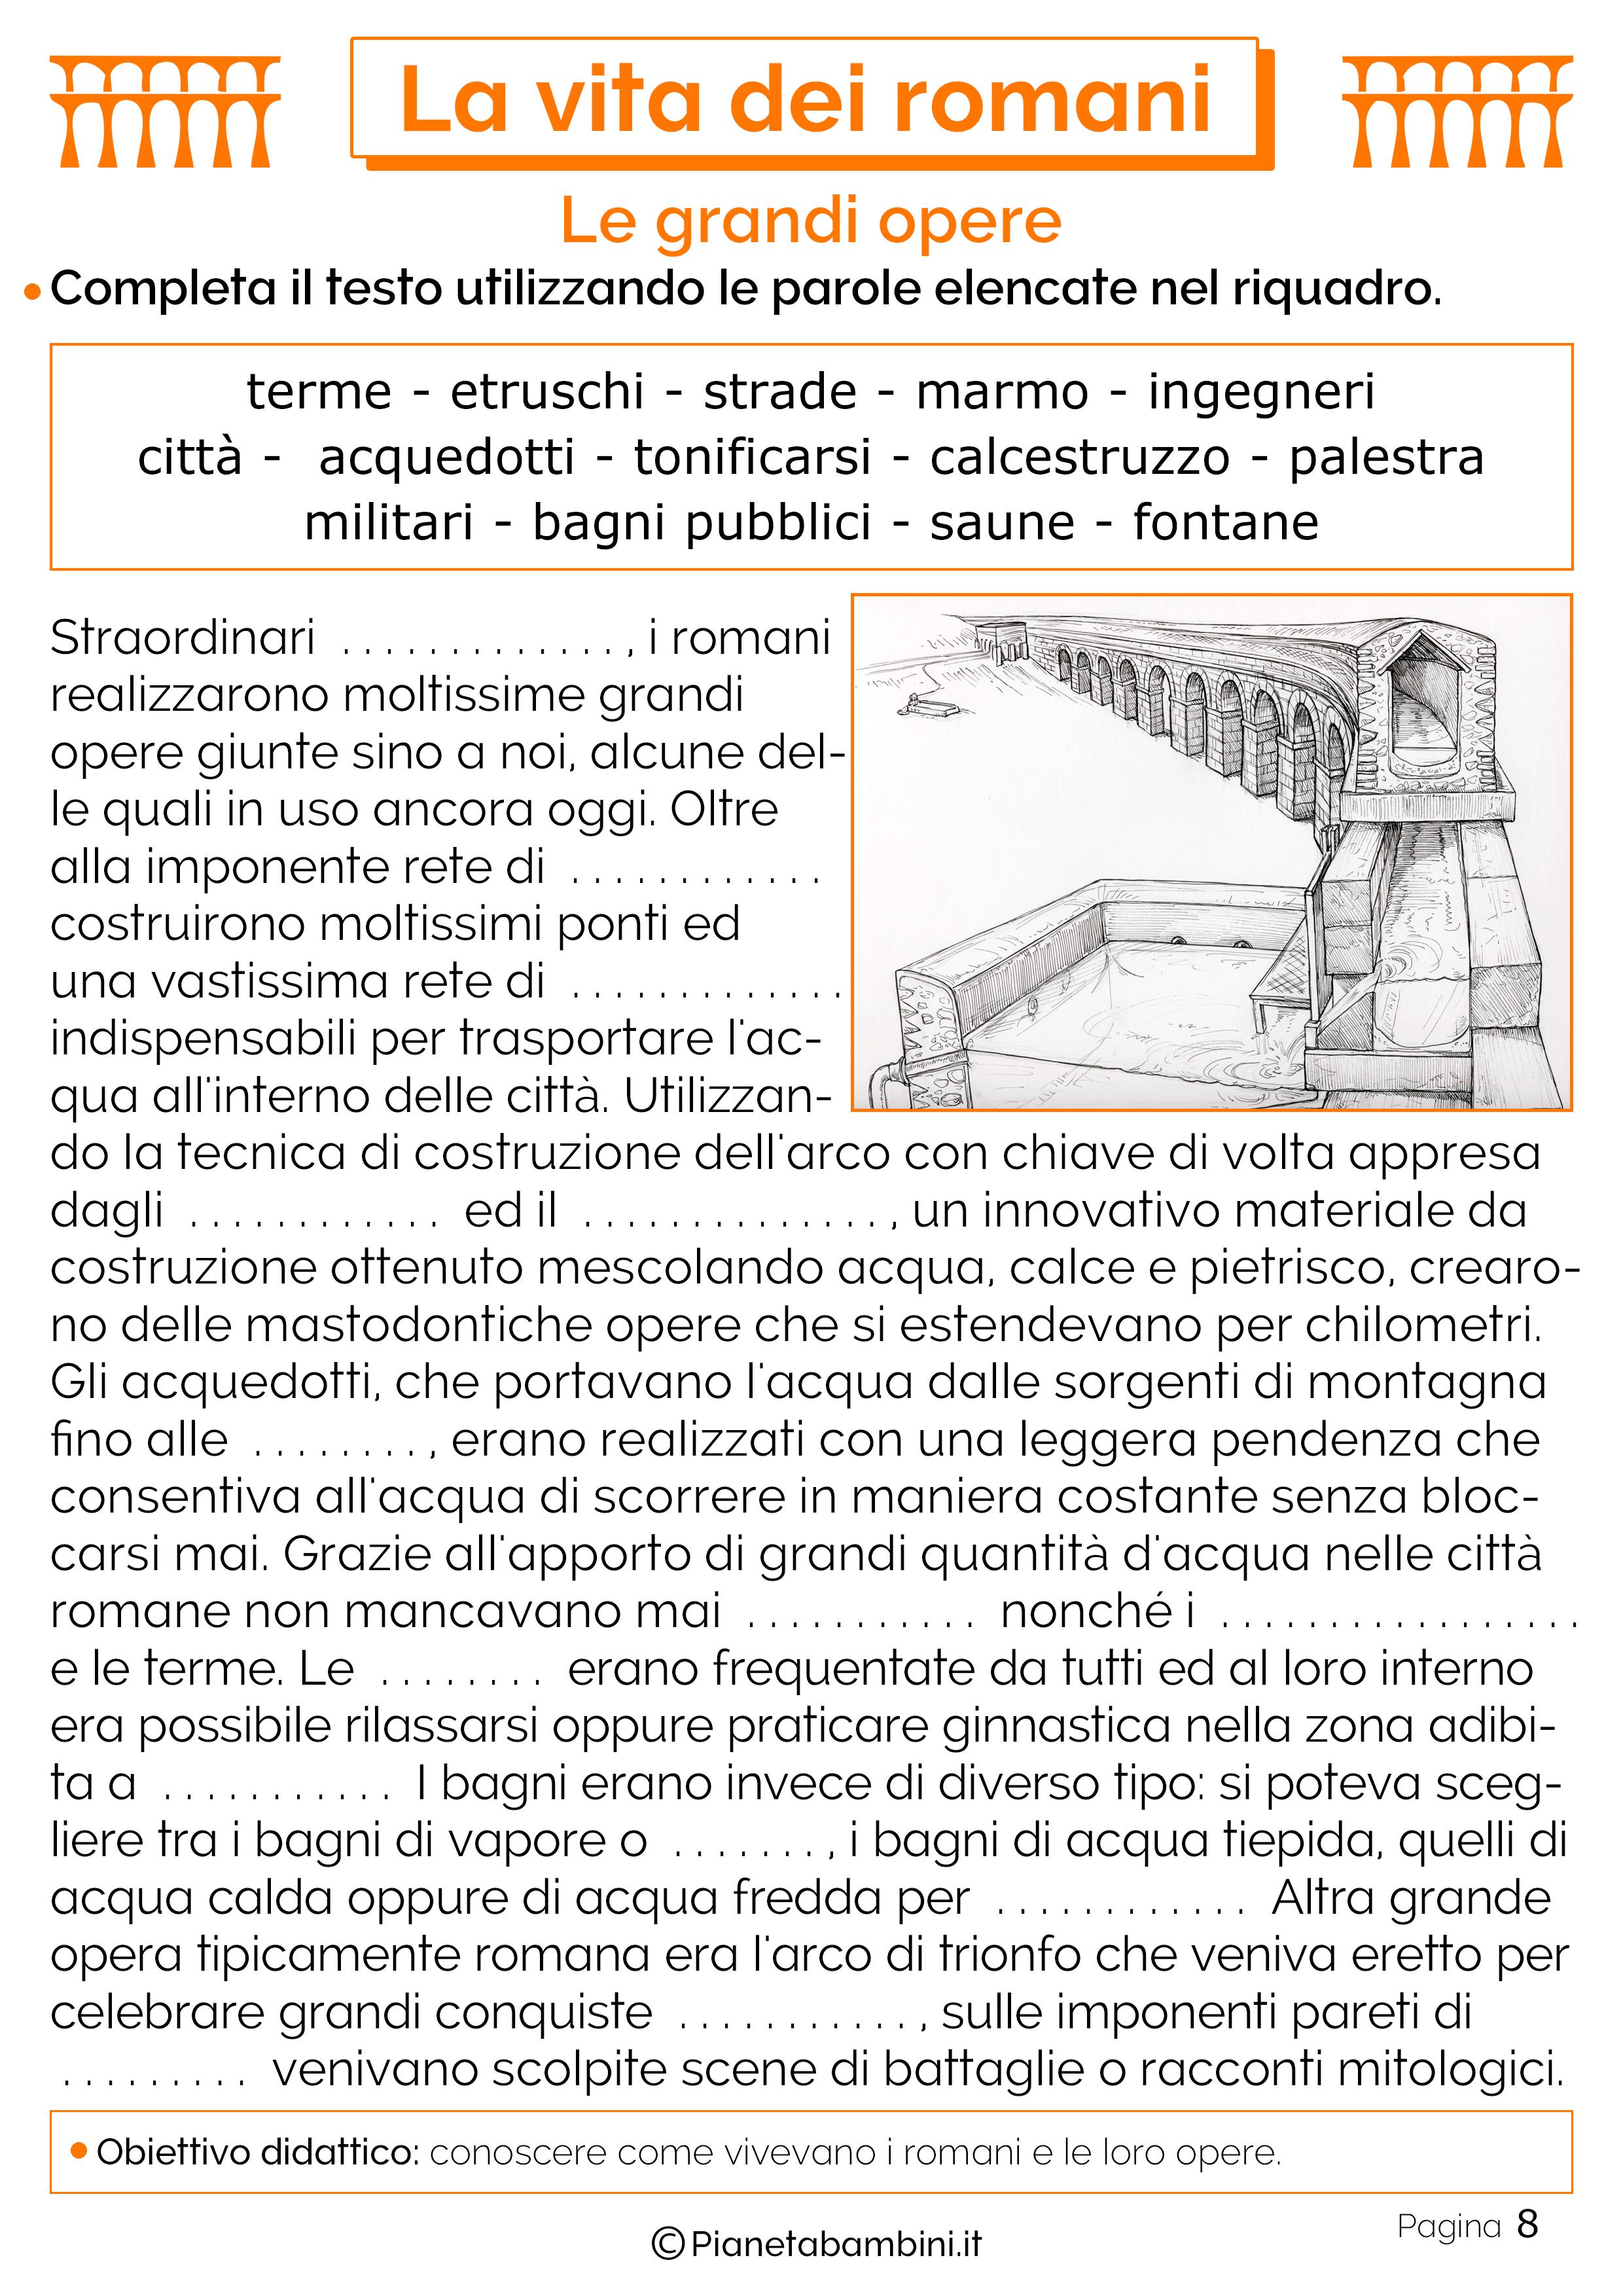 Ponti, acquedotti e terme romane